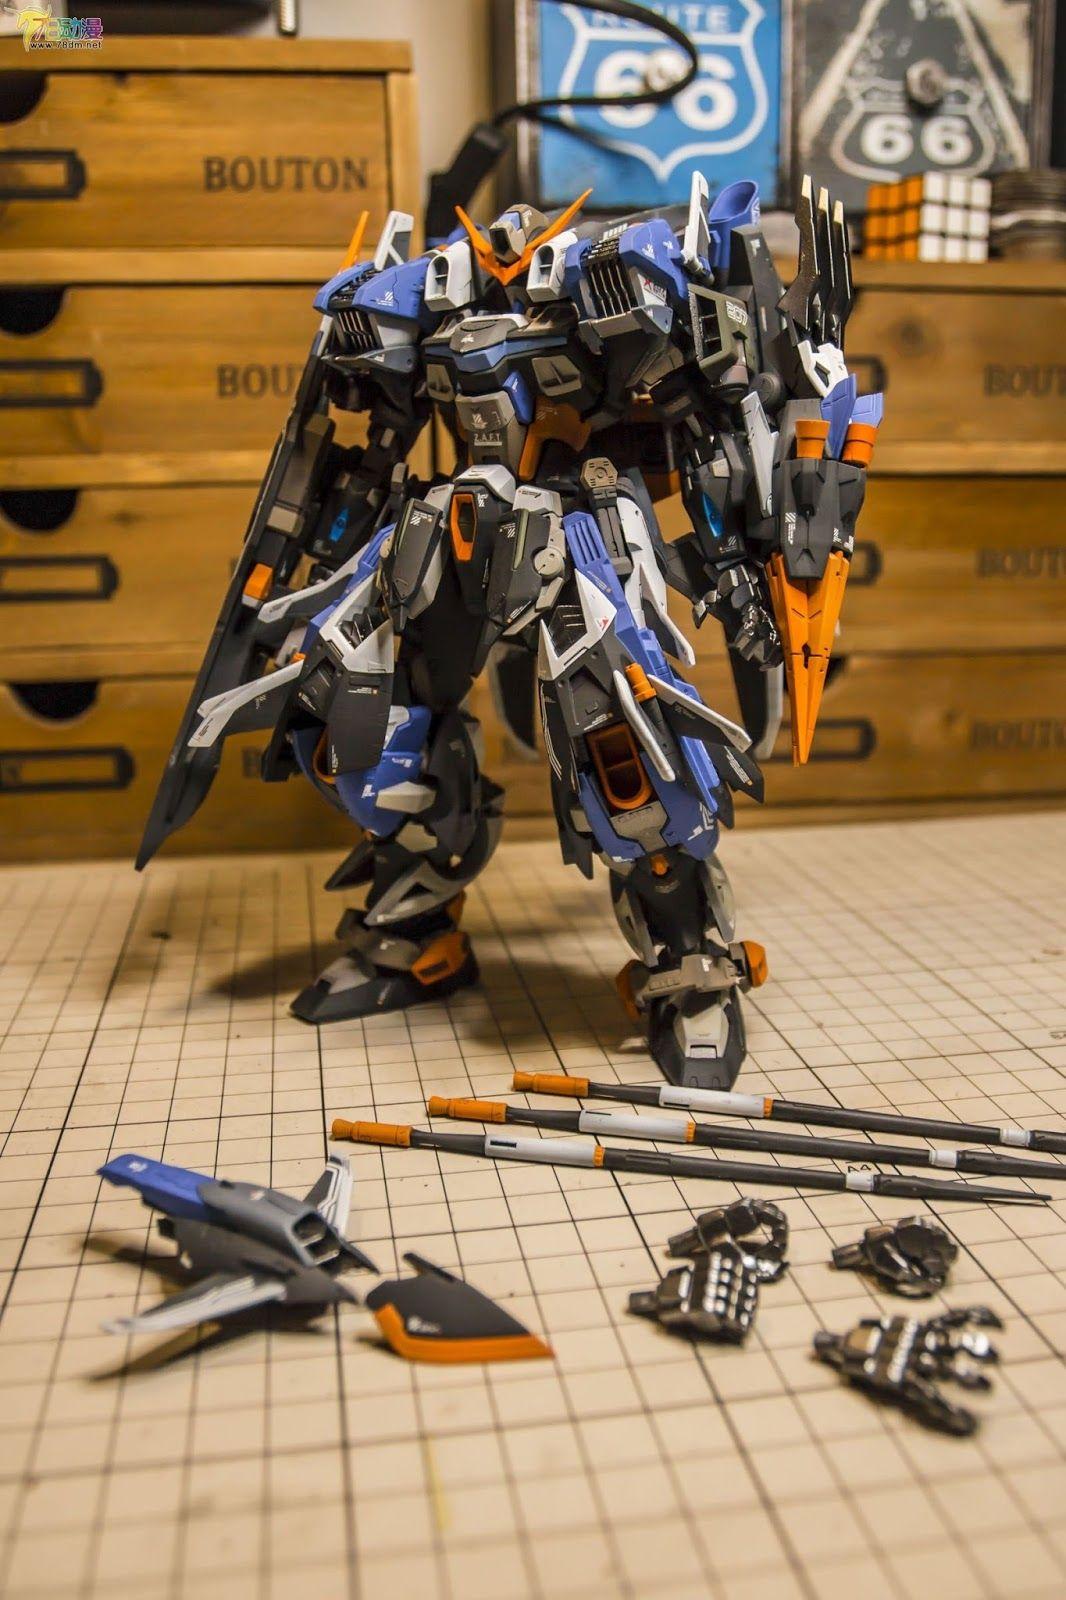 201009y9h7b4ftm9h66x6z.jpg 1,066×1,600ピクセル Gundam toys